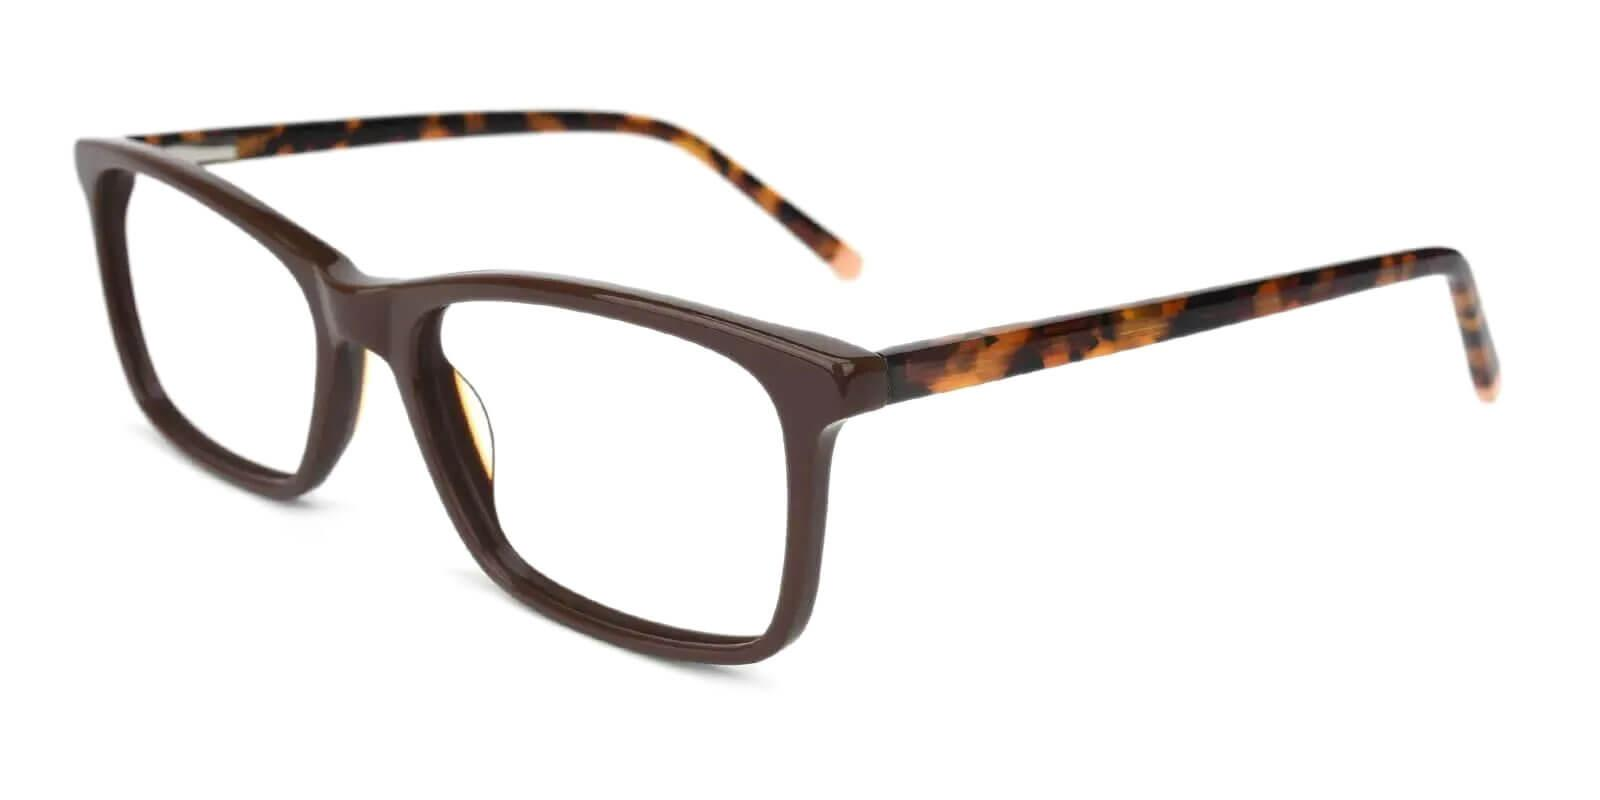 Quasqueton Brown Acetate Eyeglasses , SpringHinges , UniversalBridgeFit Frames from ABBE Glasses